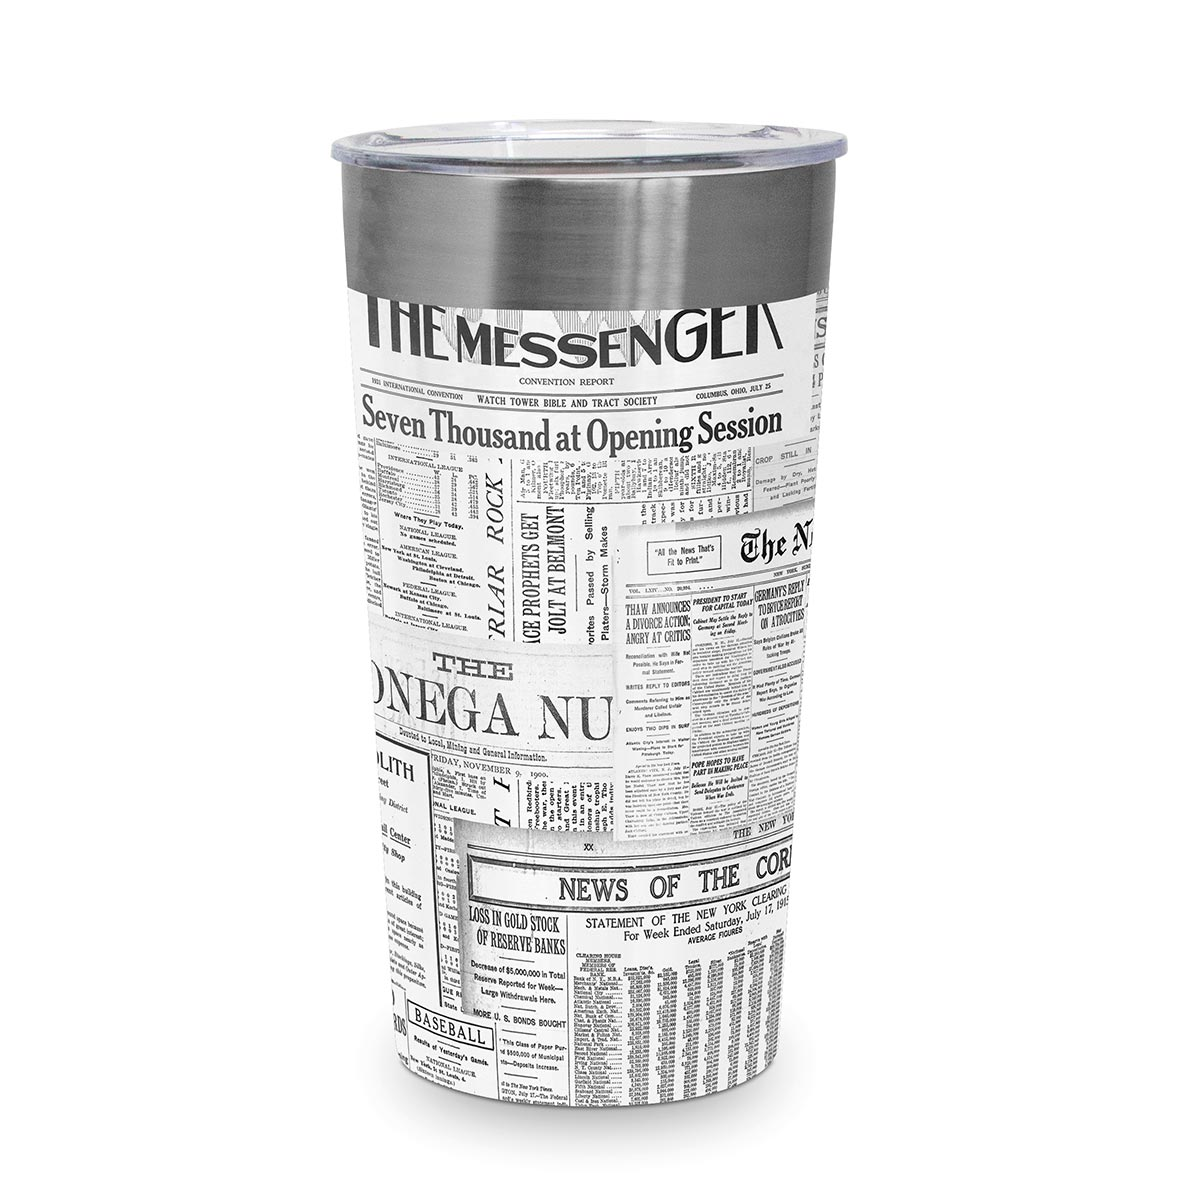 The Messenger Steel Travel Mug